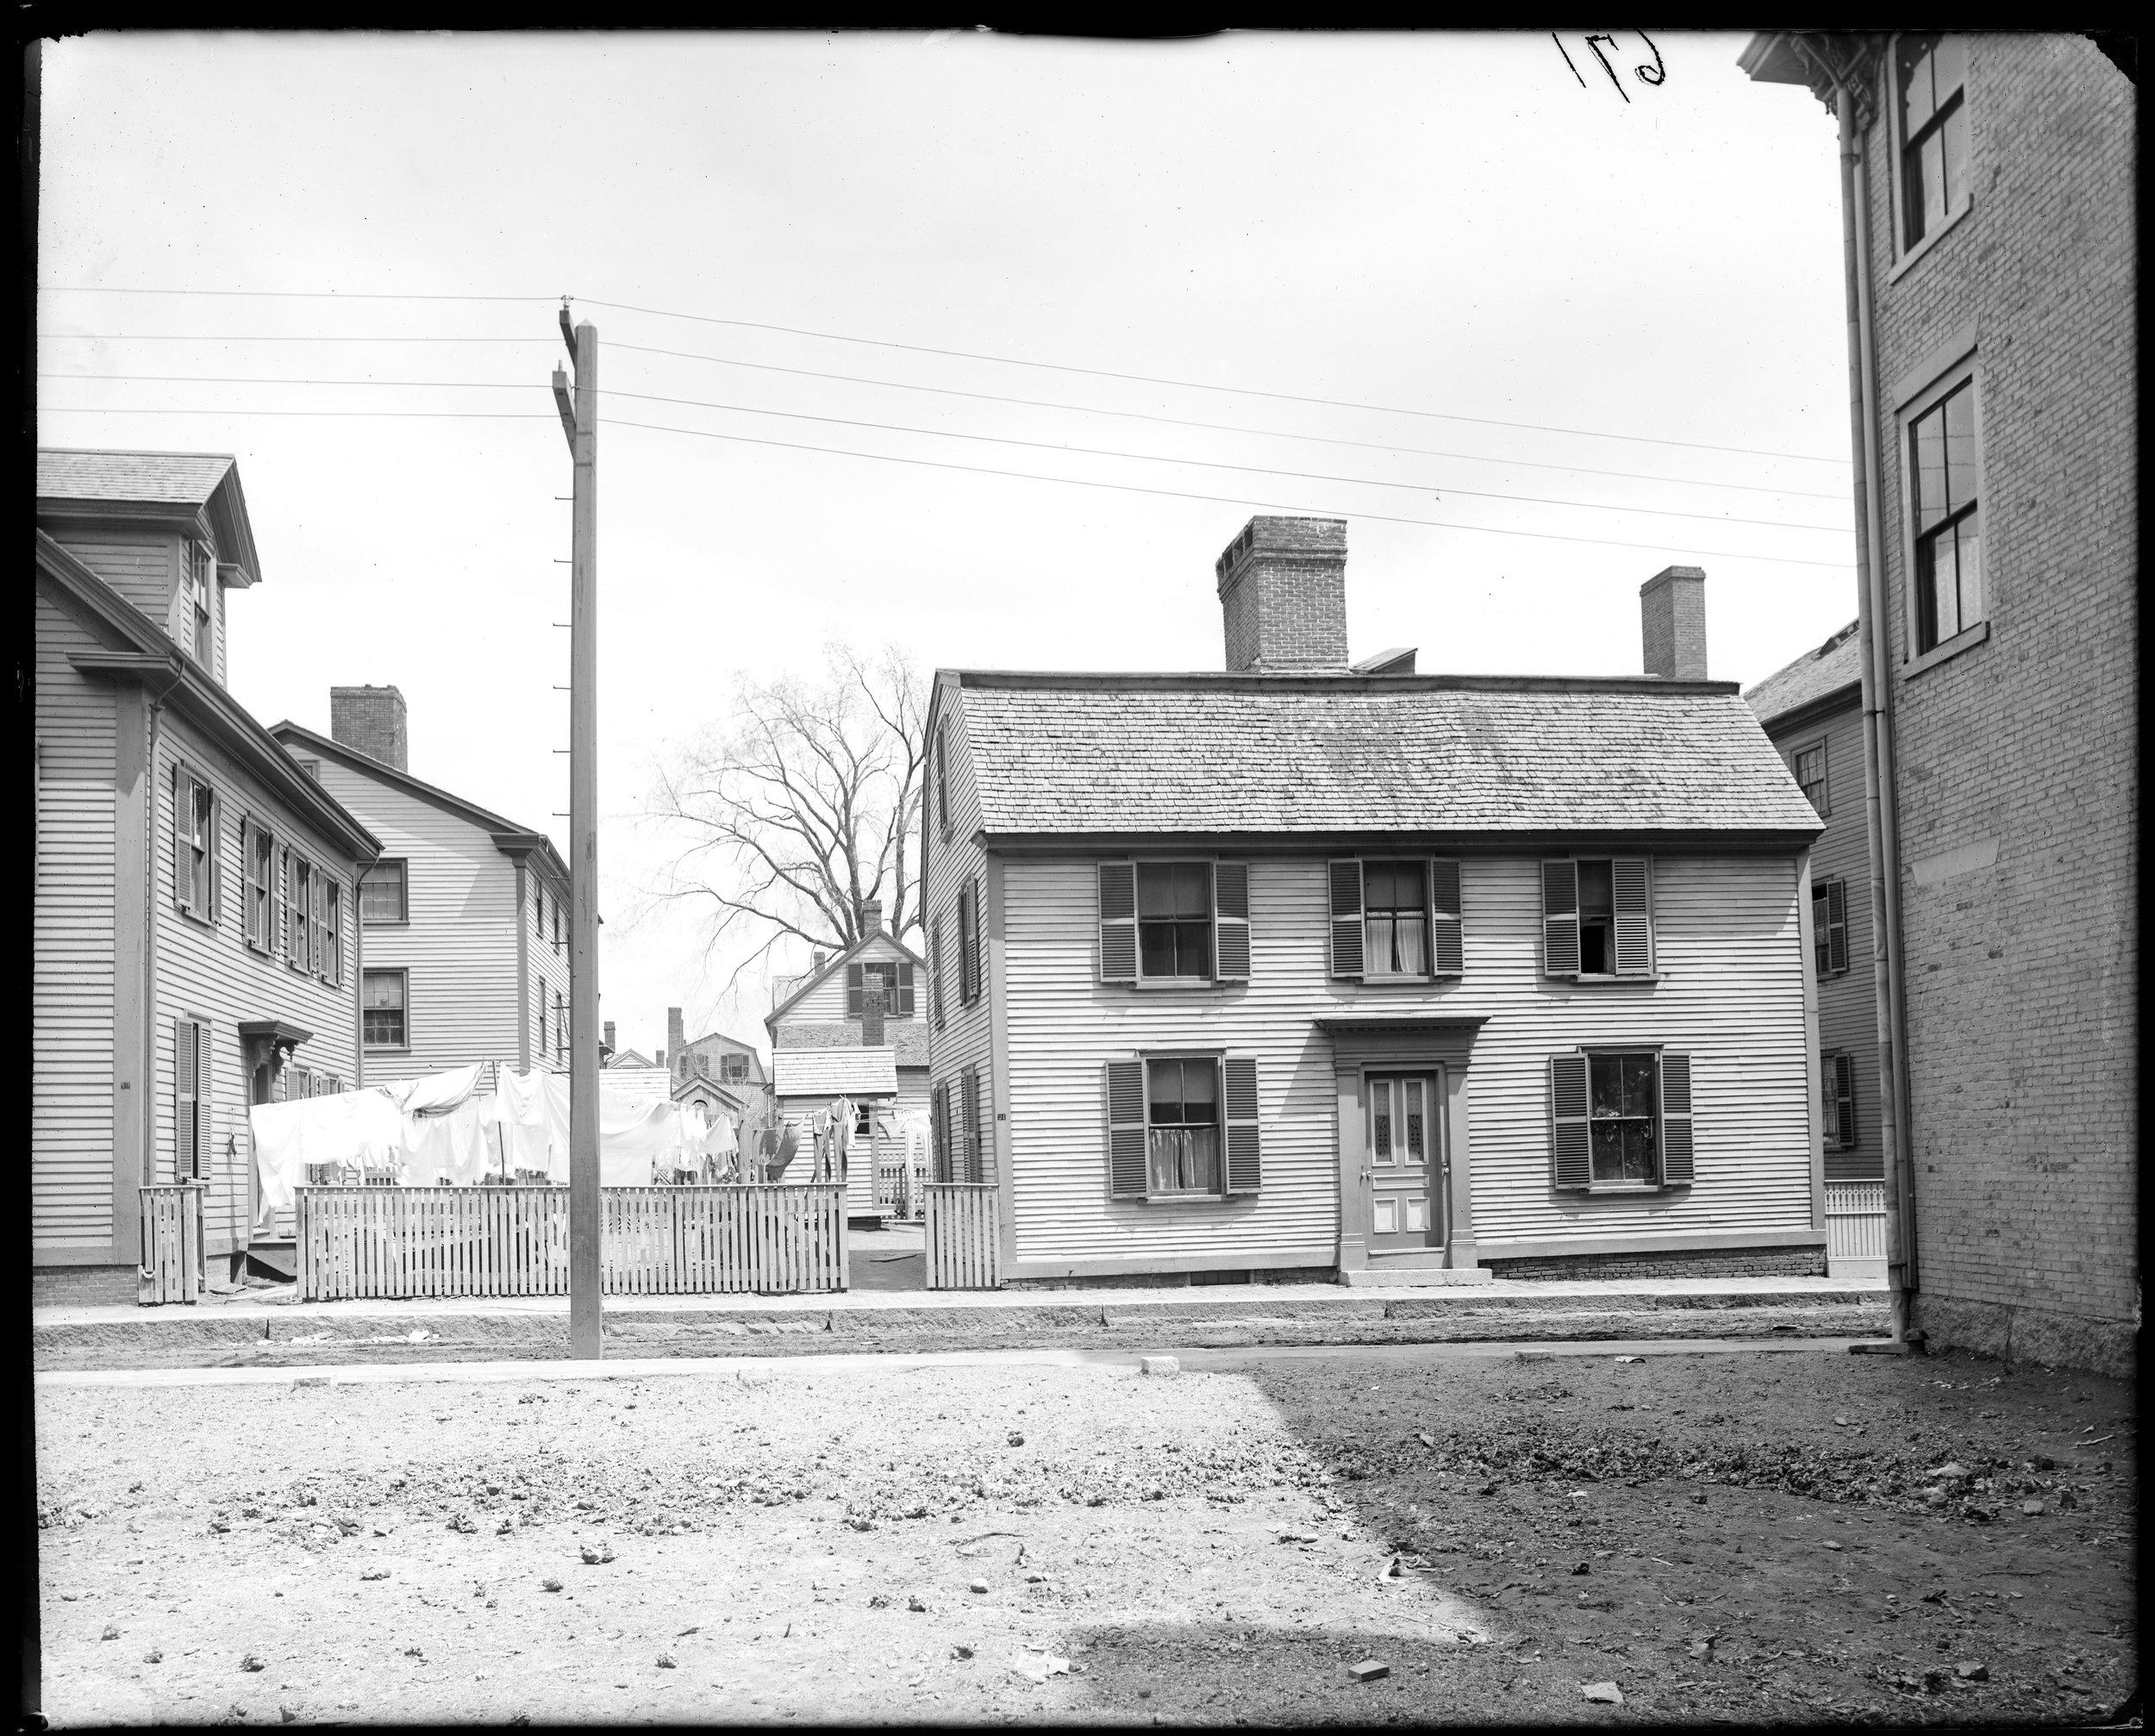 """Salem, 27 Union Street, birthplace of Nathaniel Hawthorne"""